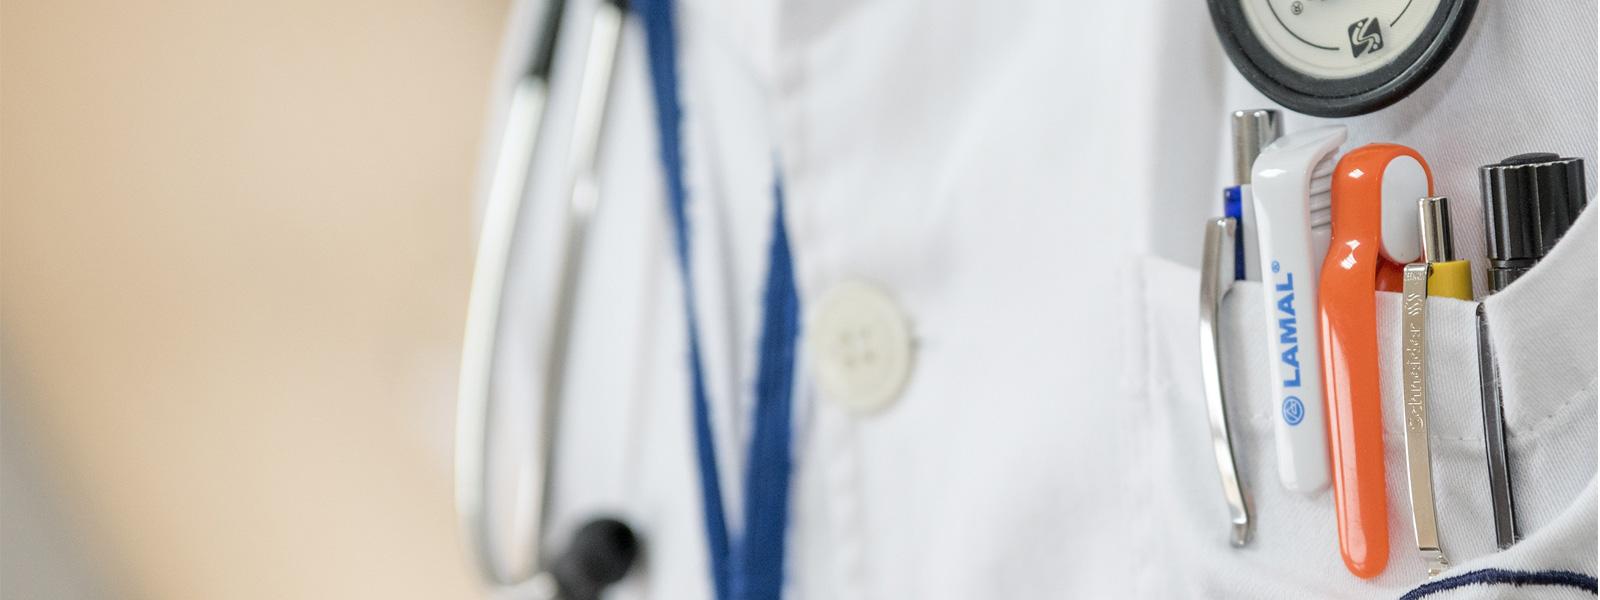 Triage ostetrico e ginecologico